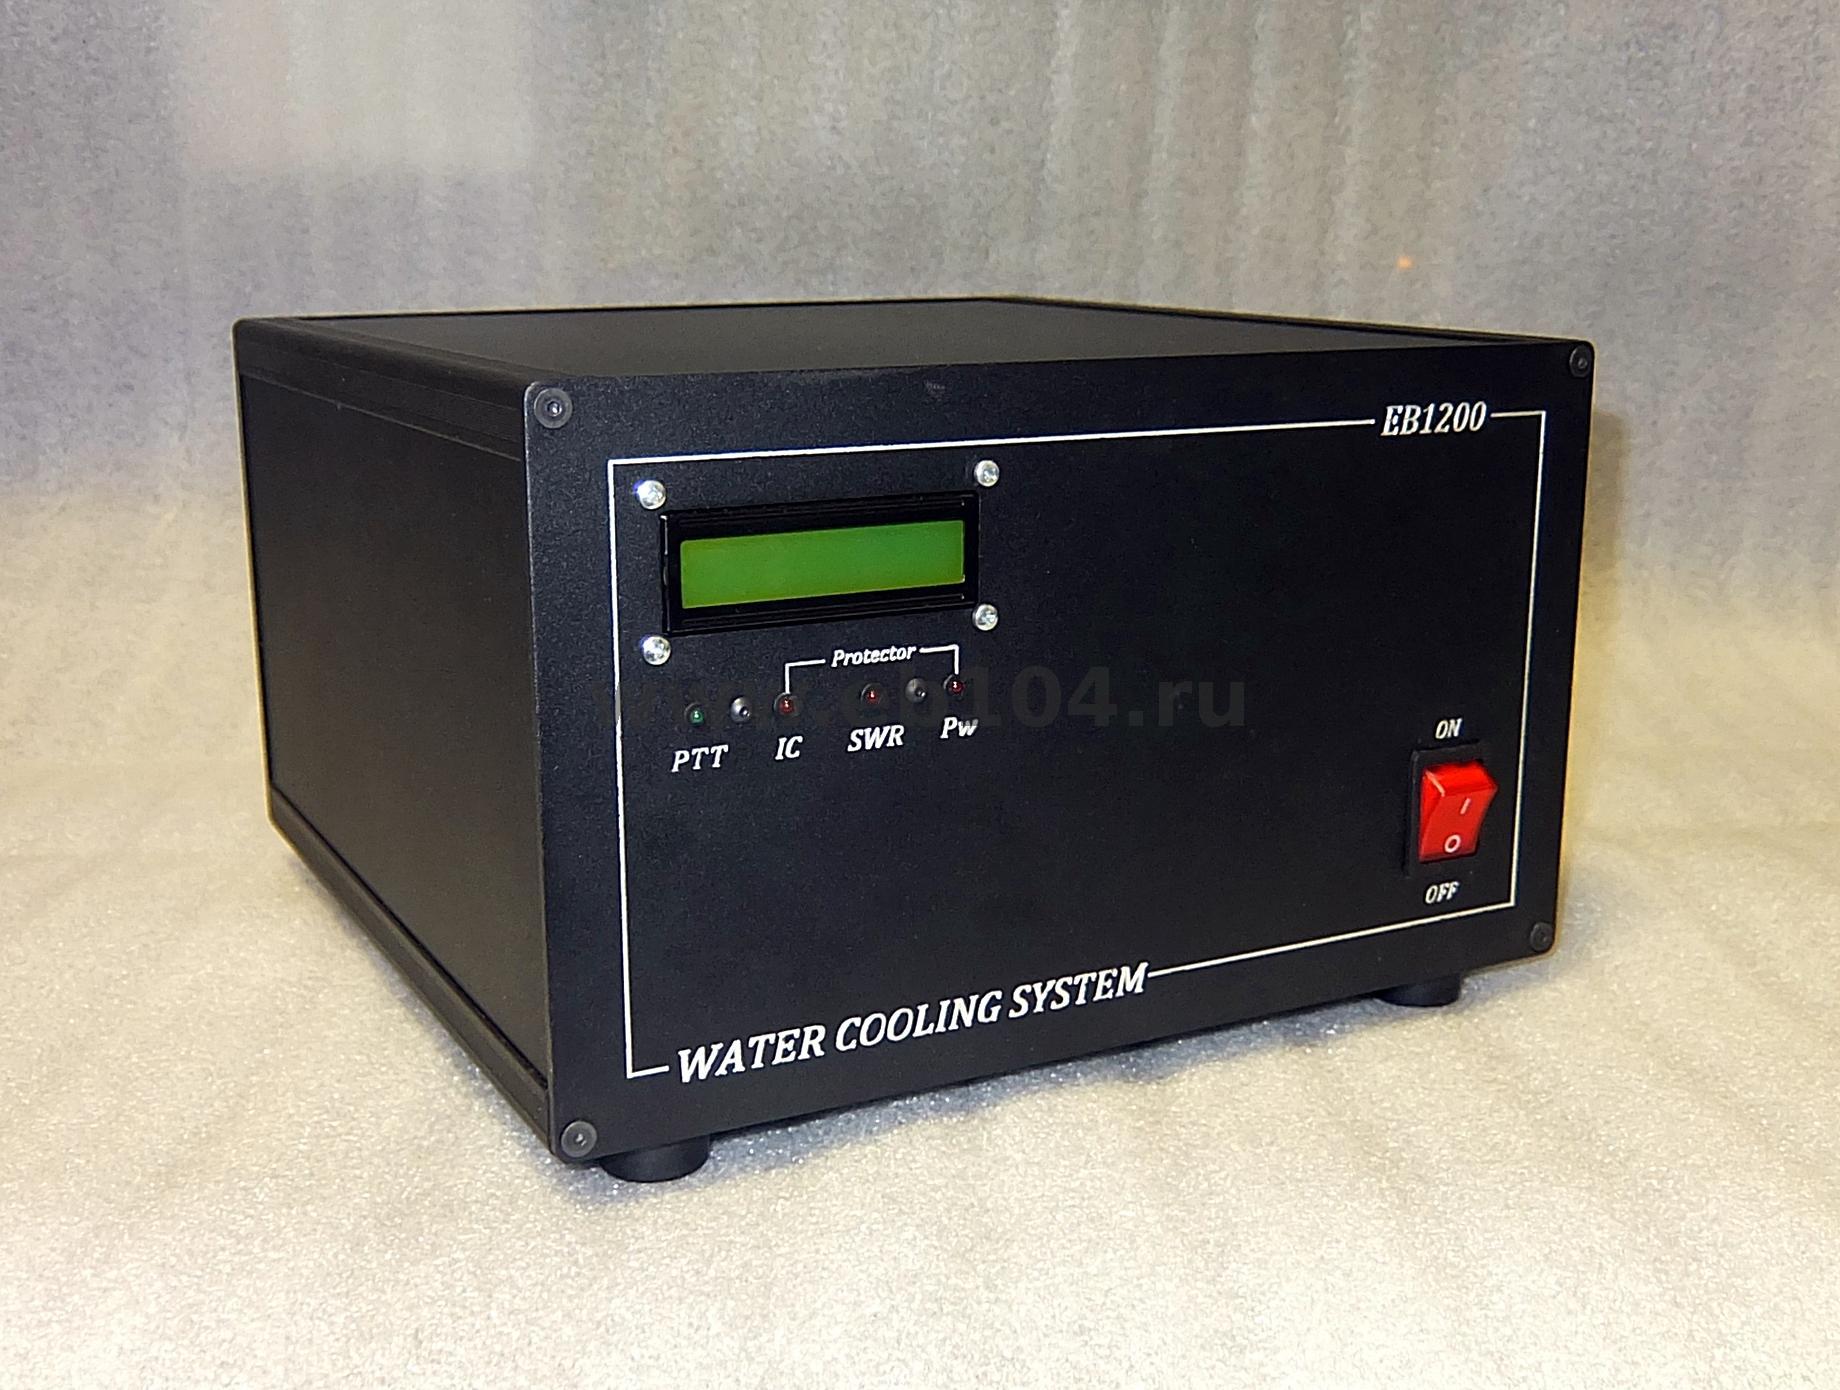 LDMOS power amplifier 1 8-54 MHz 1000W for HERMES 0 5W input BLF188XR